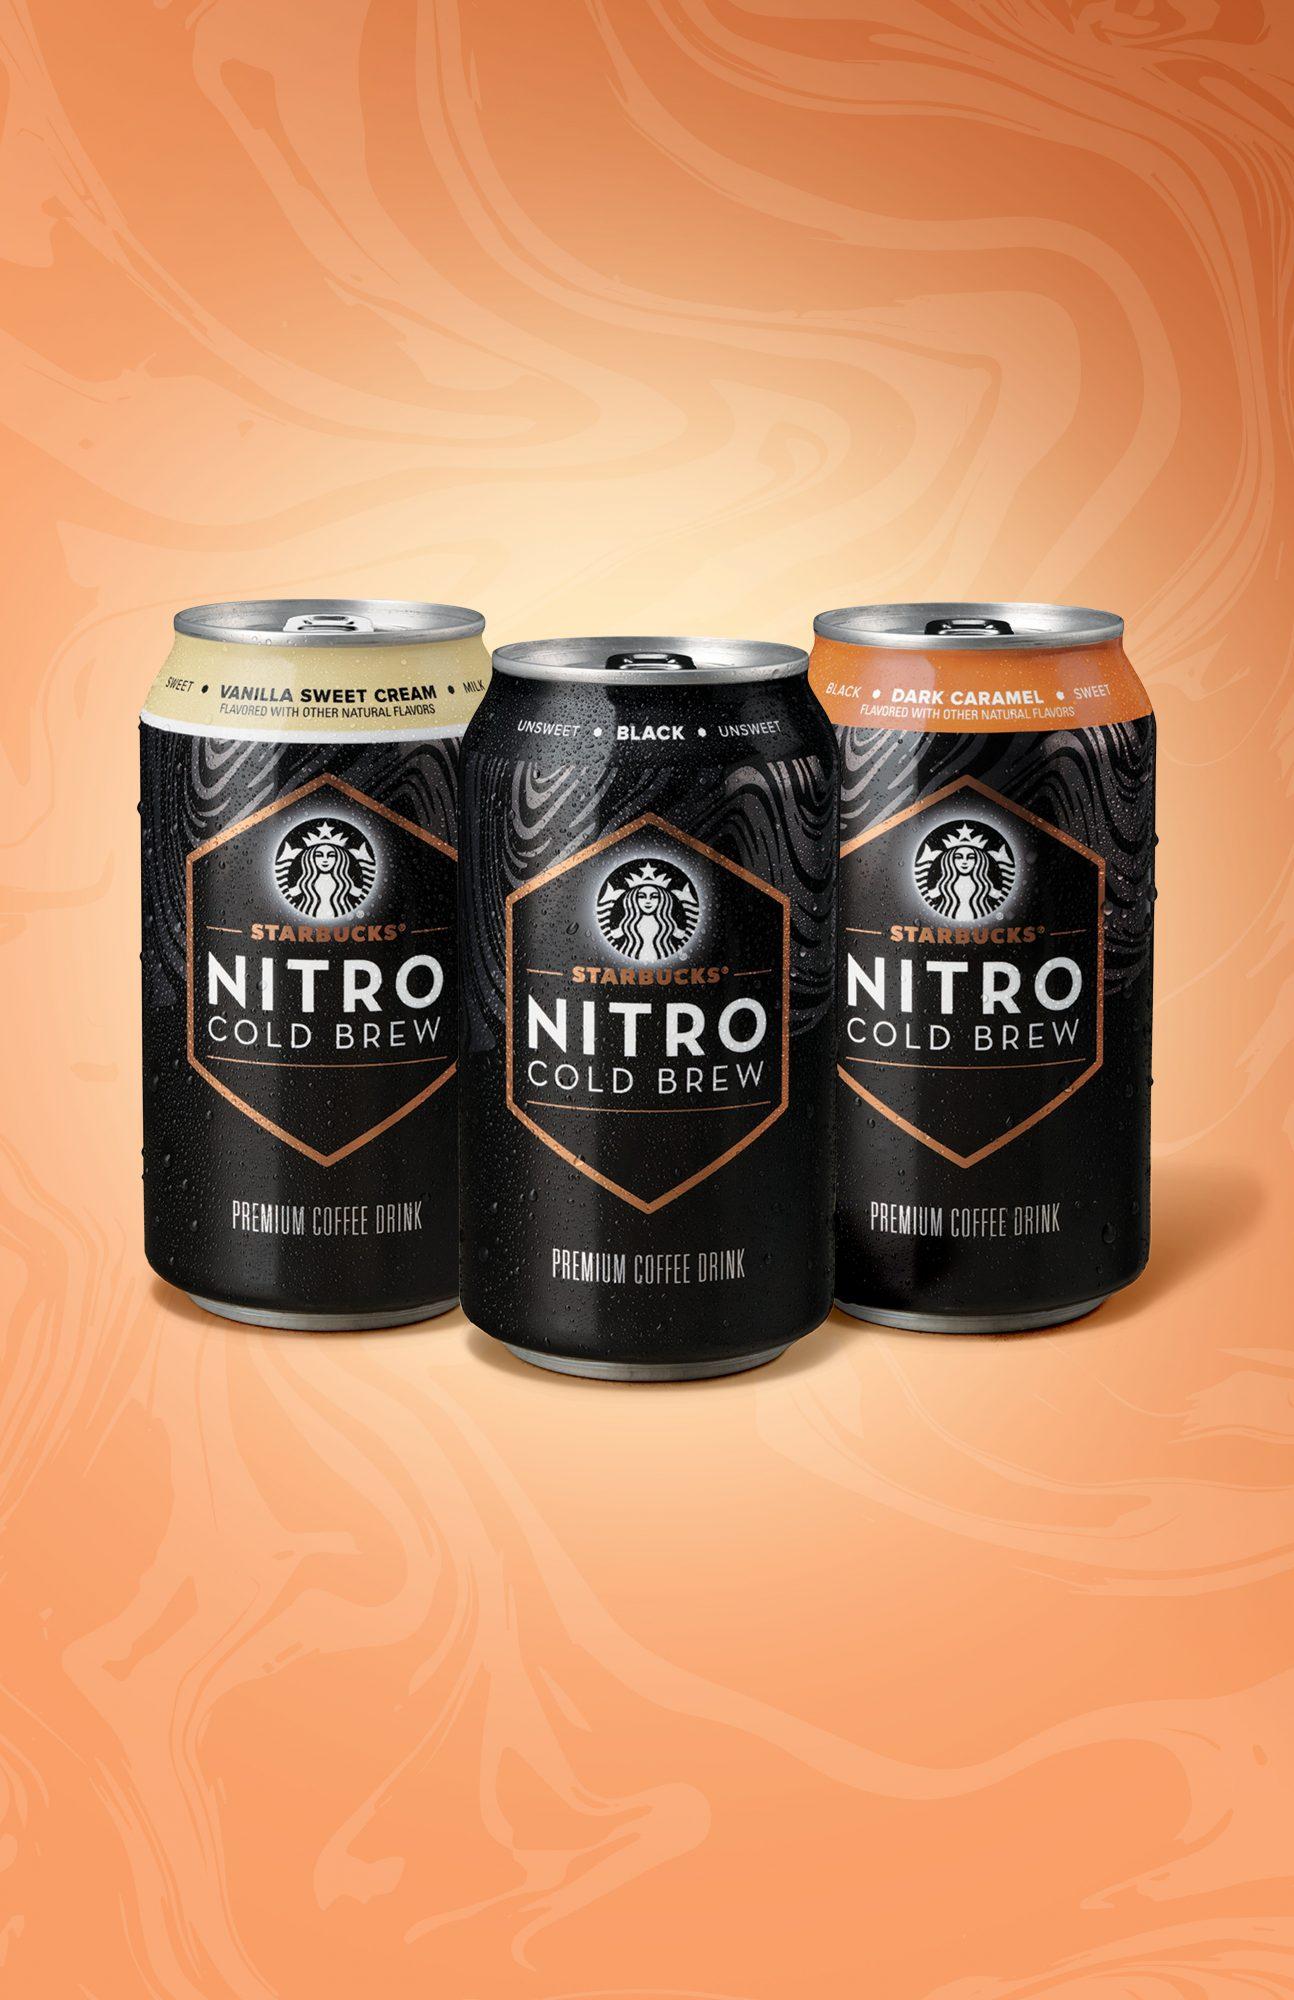 RTD Nitro Cold Brew Group